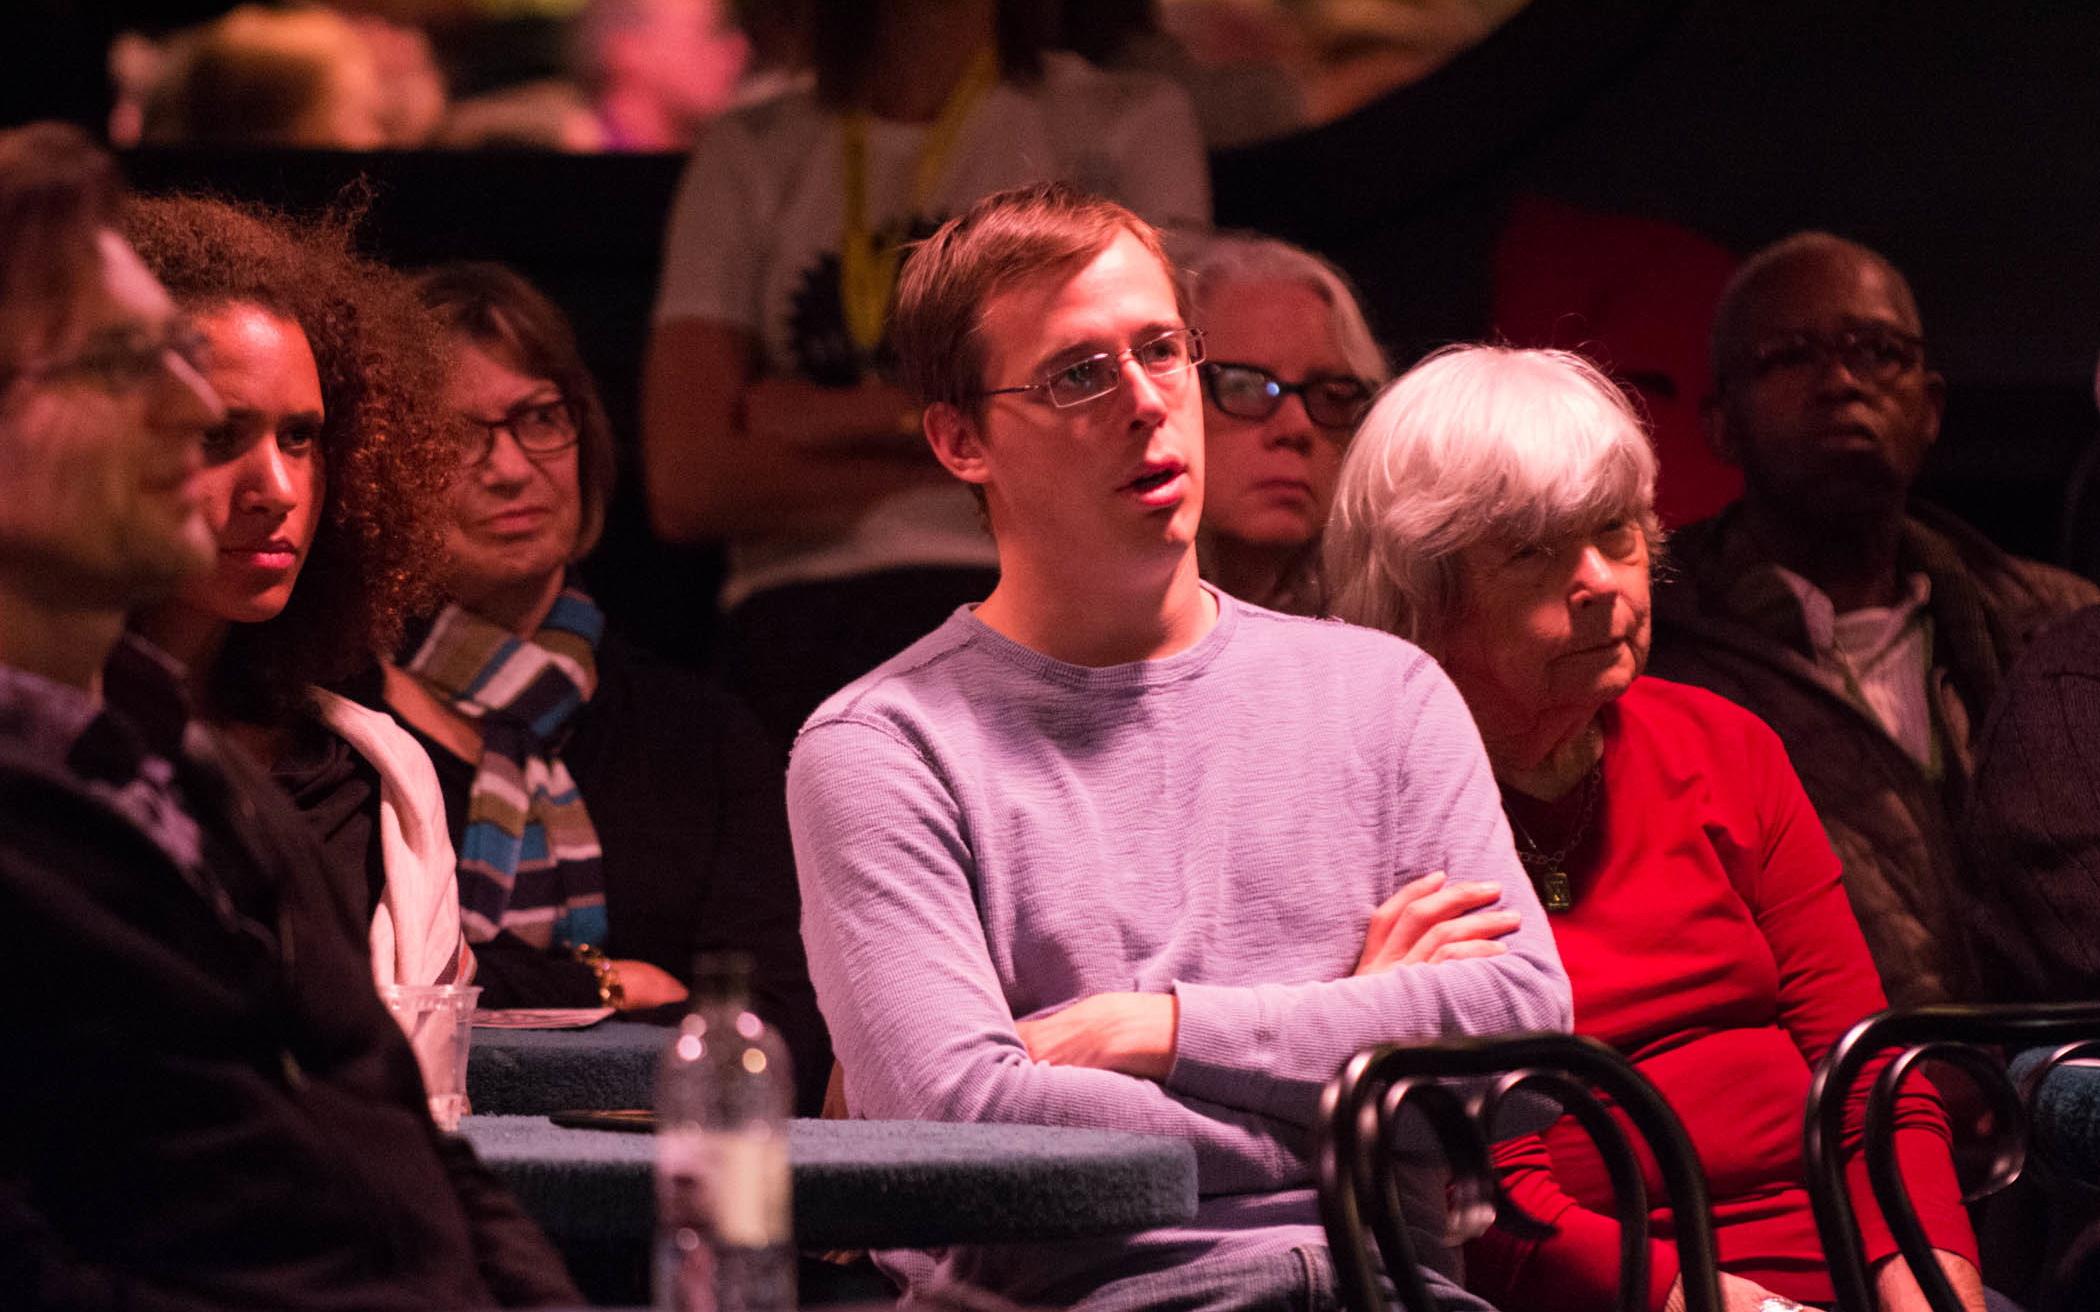 Crowd - Ryeberg Live Banff 2013